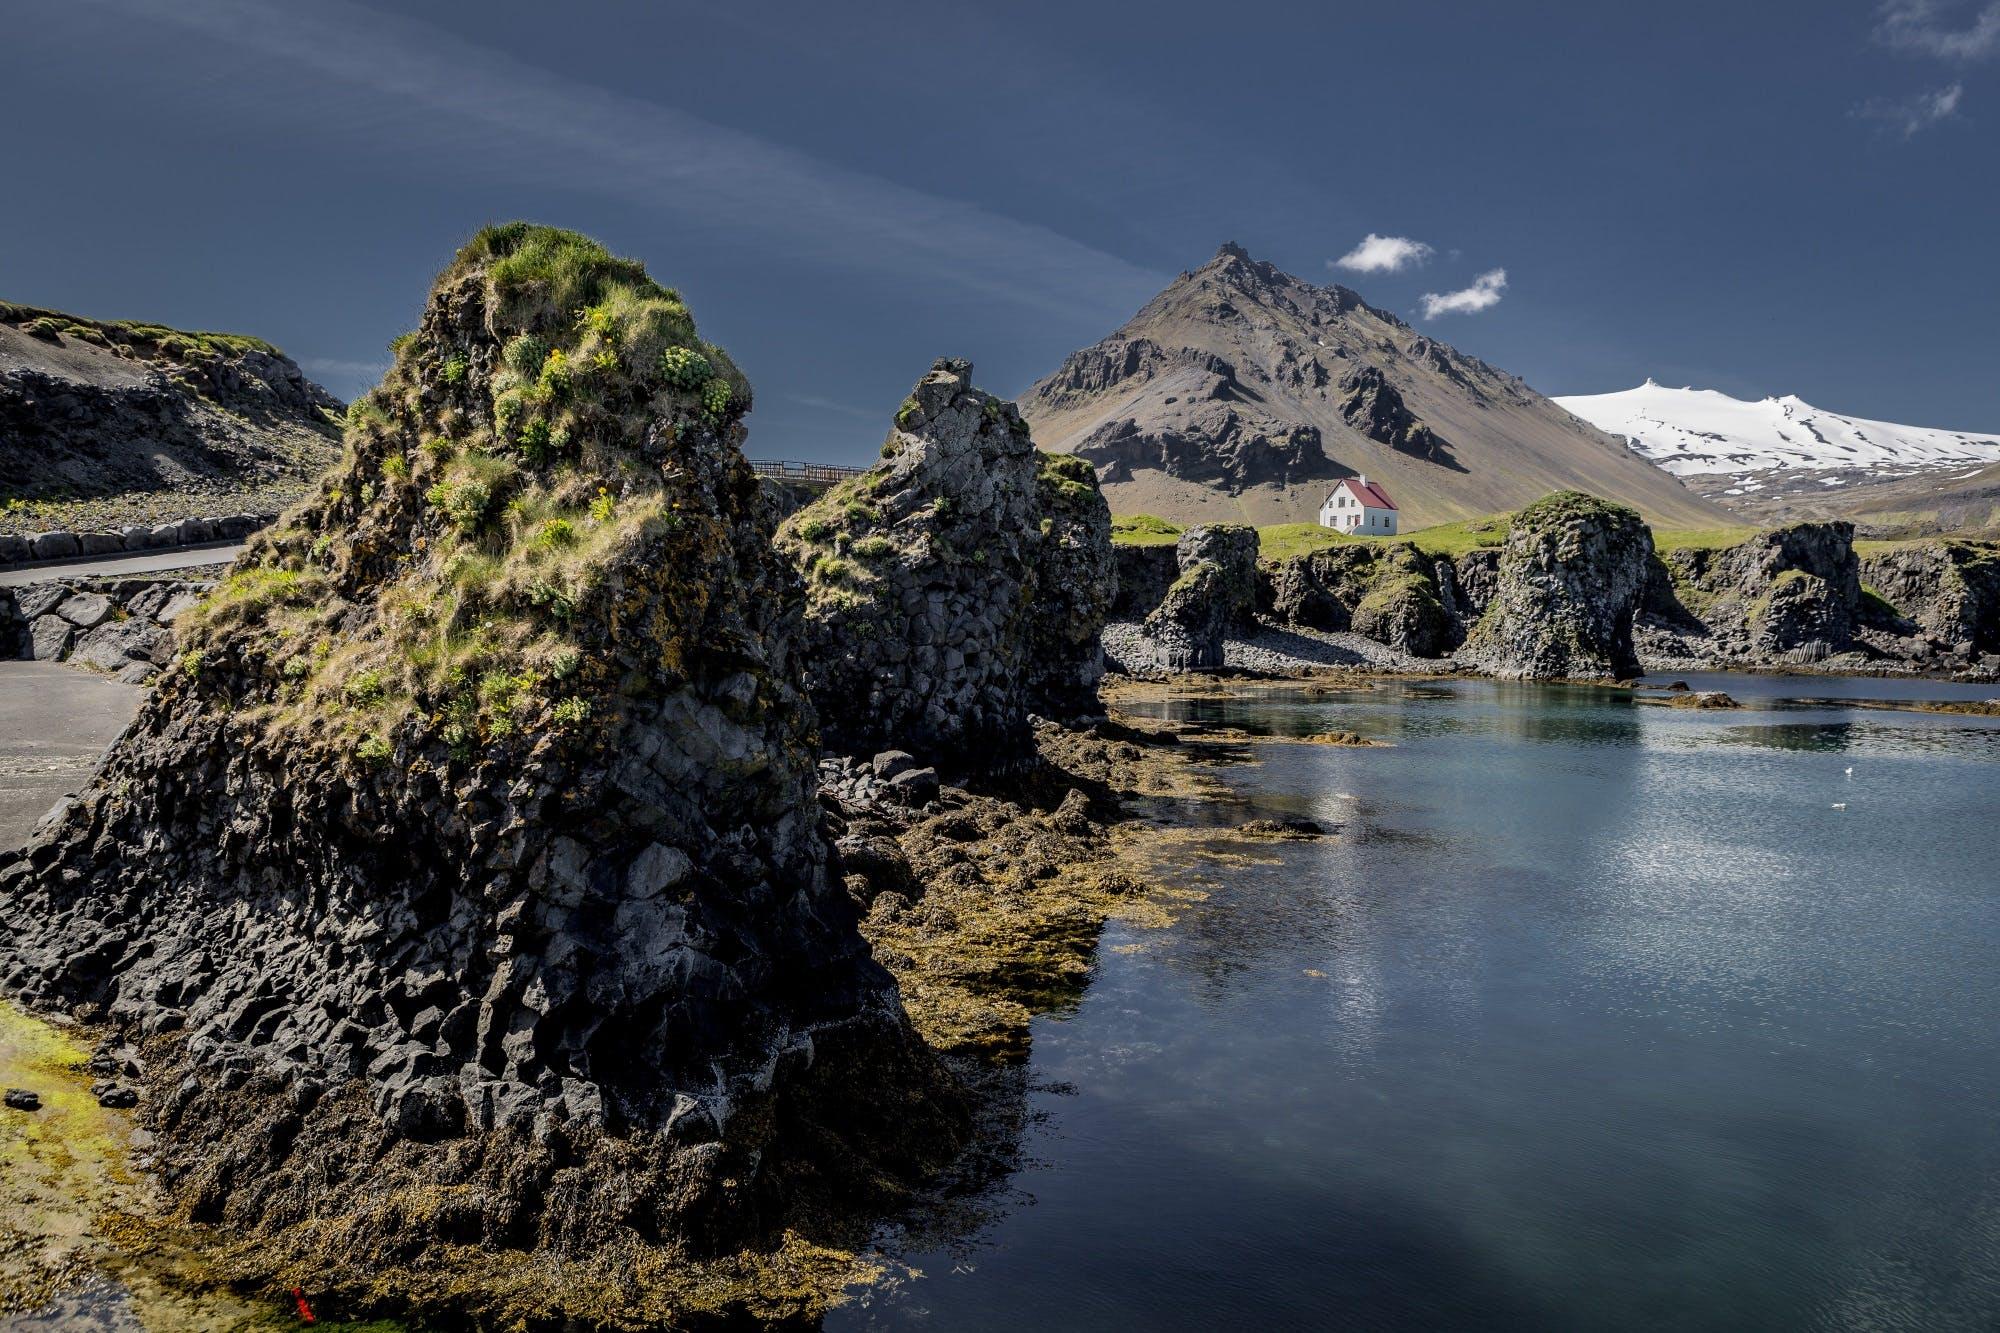 The beautiful columnar basalt formations on the coastline of Arnarstapi